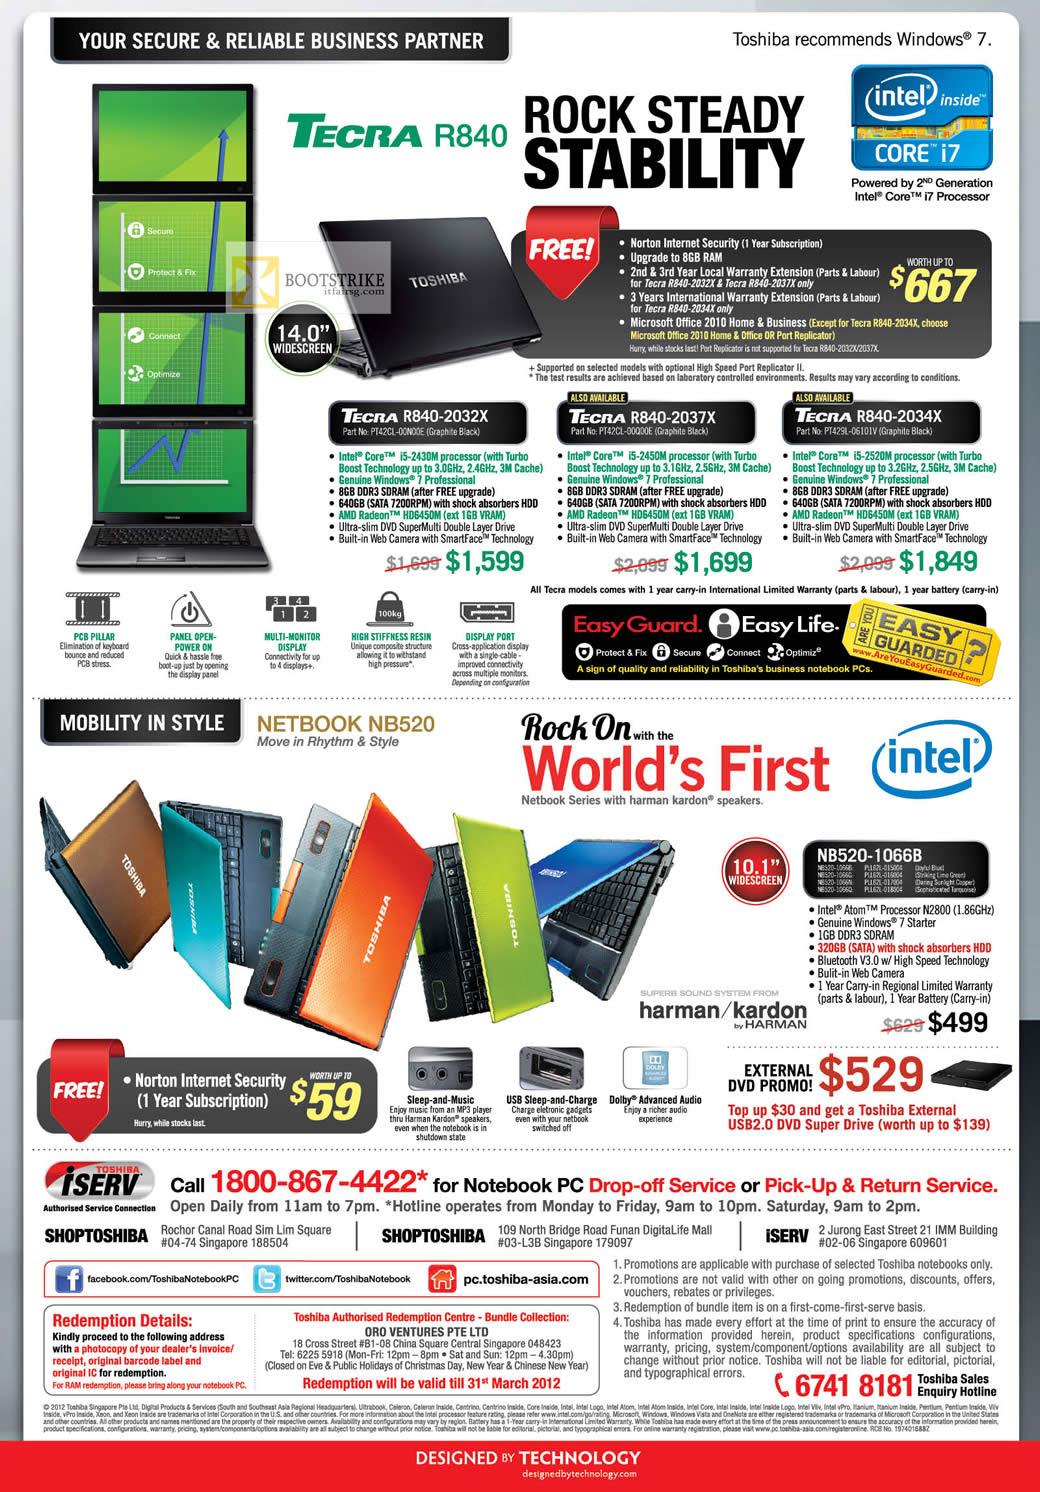 IT SHOW 2012 price list image brochure of Toshiba Notebooks Tecra R840-2032X PT42CL-00N00E, R840-2037X PT42CL-00Q00E, R840-2034X PT429L-06101V, Netbook NB520-1066B